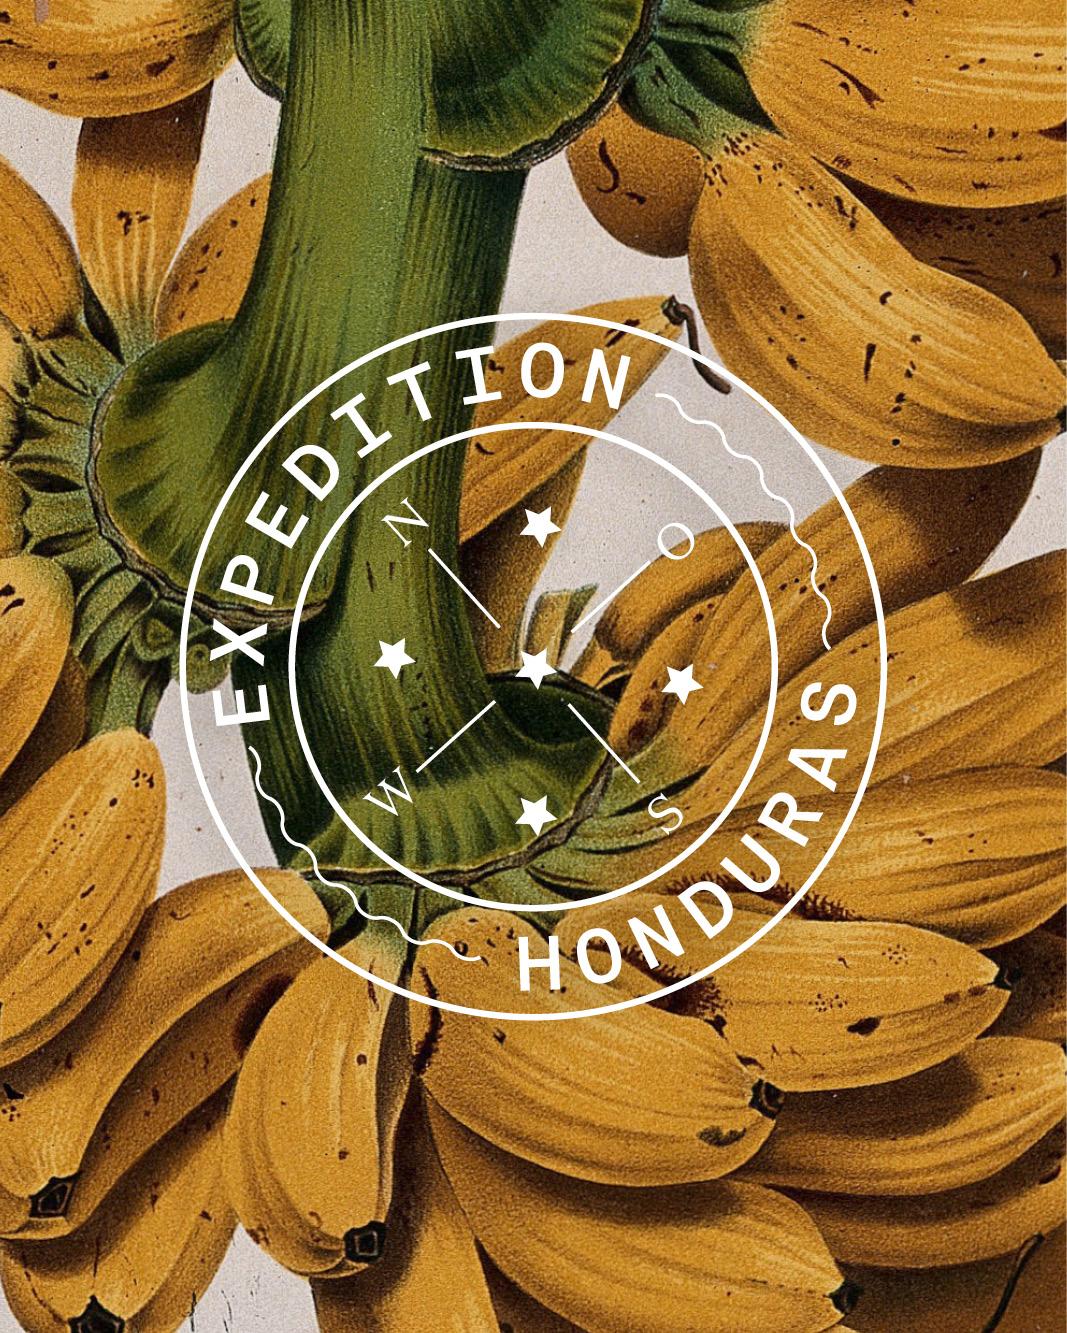 Bureau_Display_Graphic_Design_Visual_Communication_Lucerne_Zurich_Expedition_Honduras_Thumb